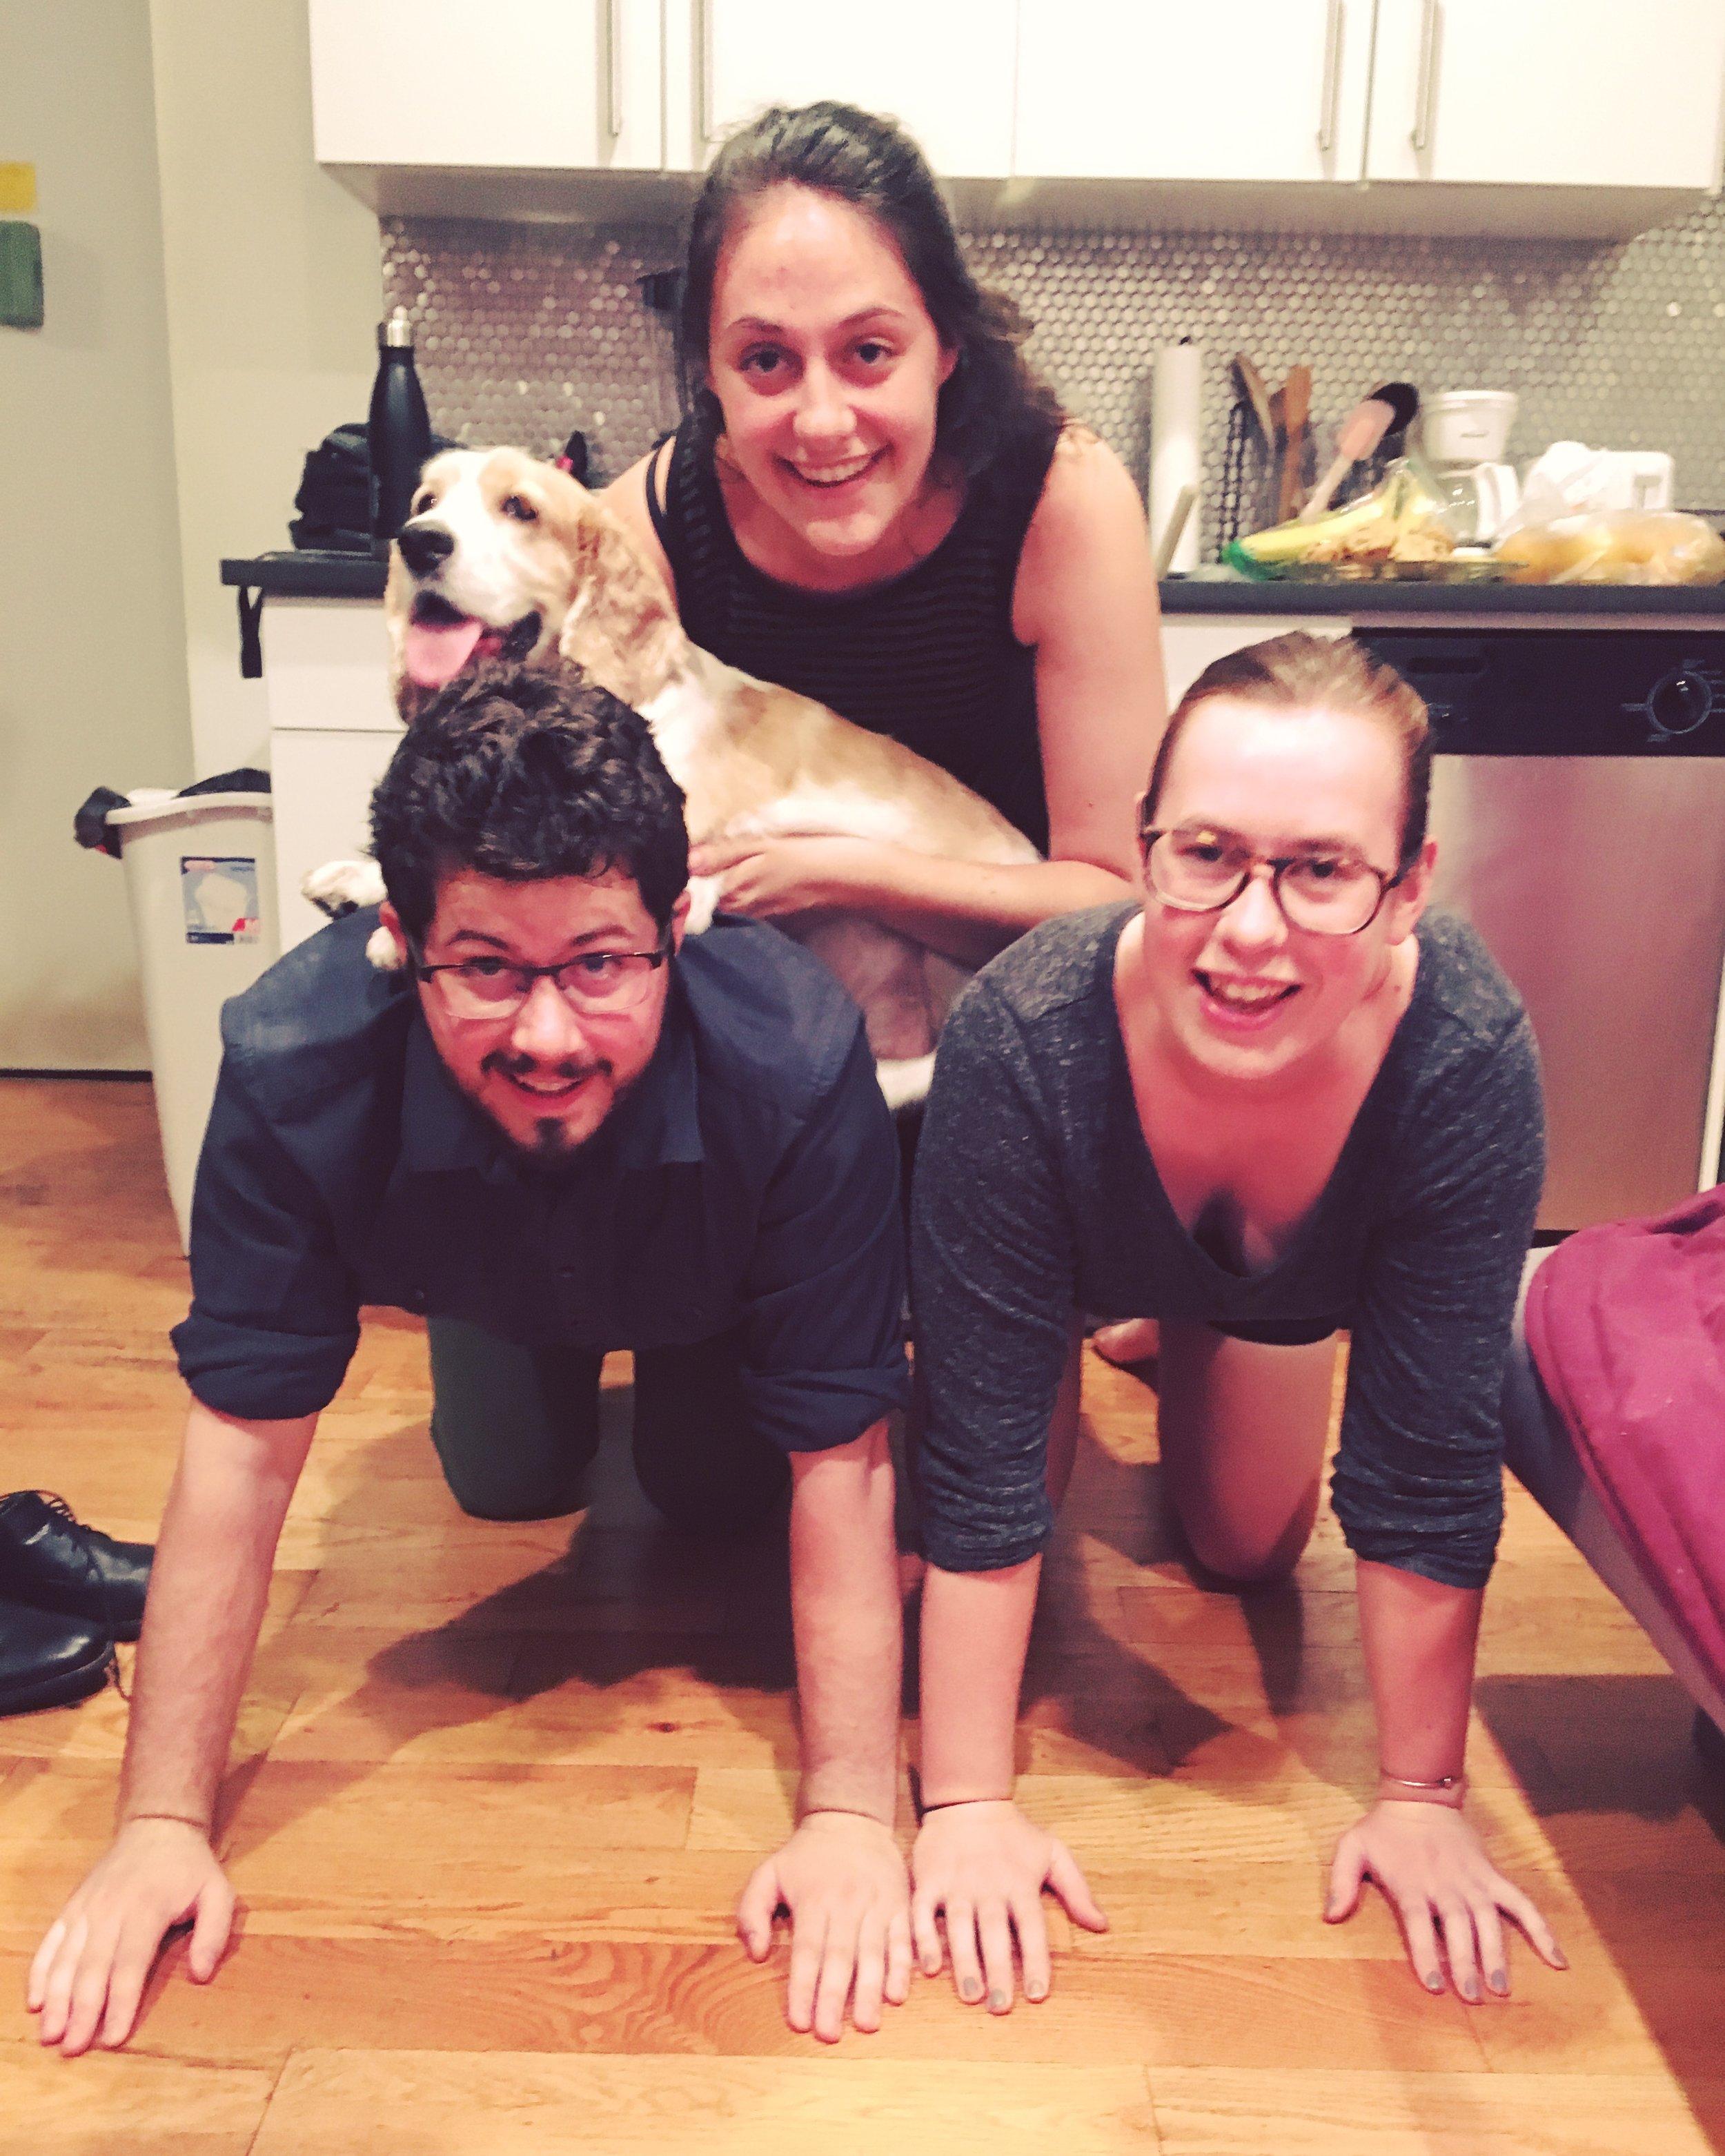 Human-dog pyramid aka, apartment boredom